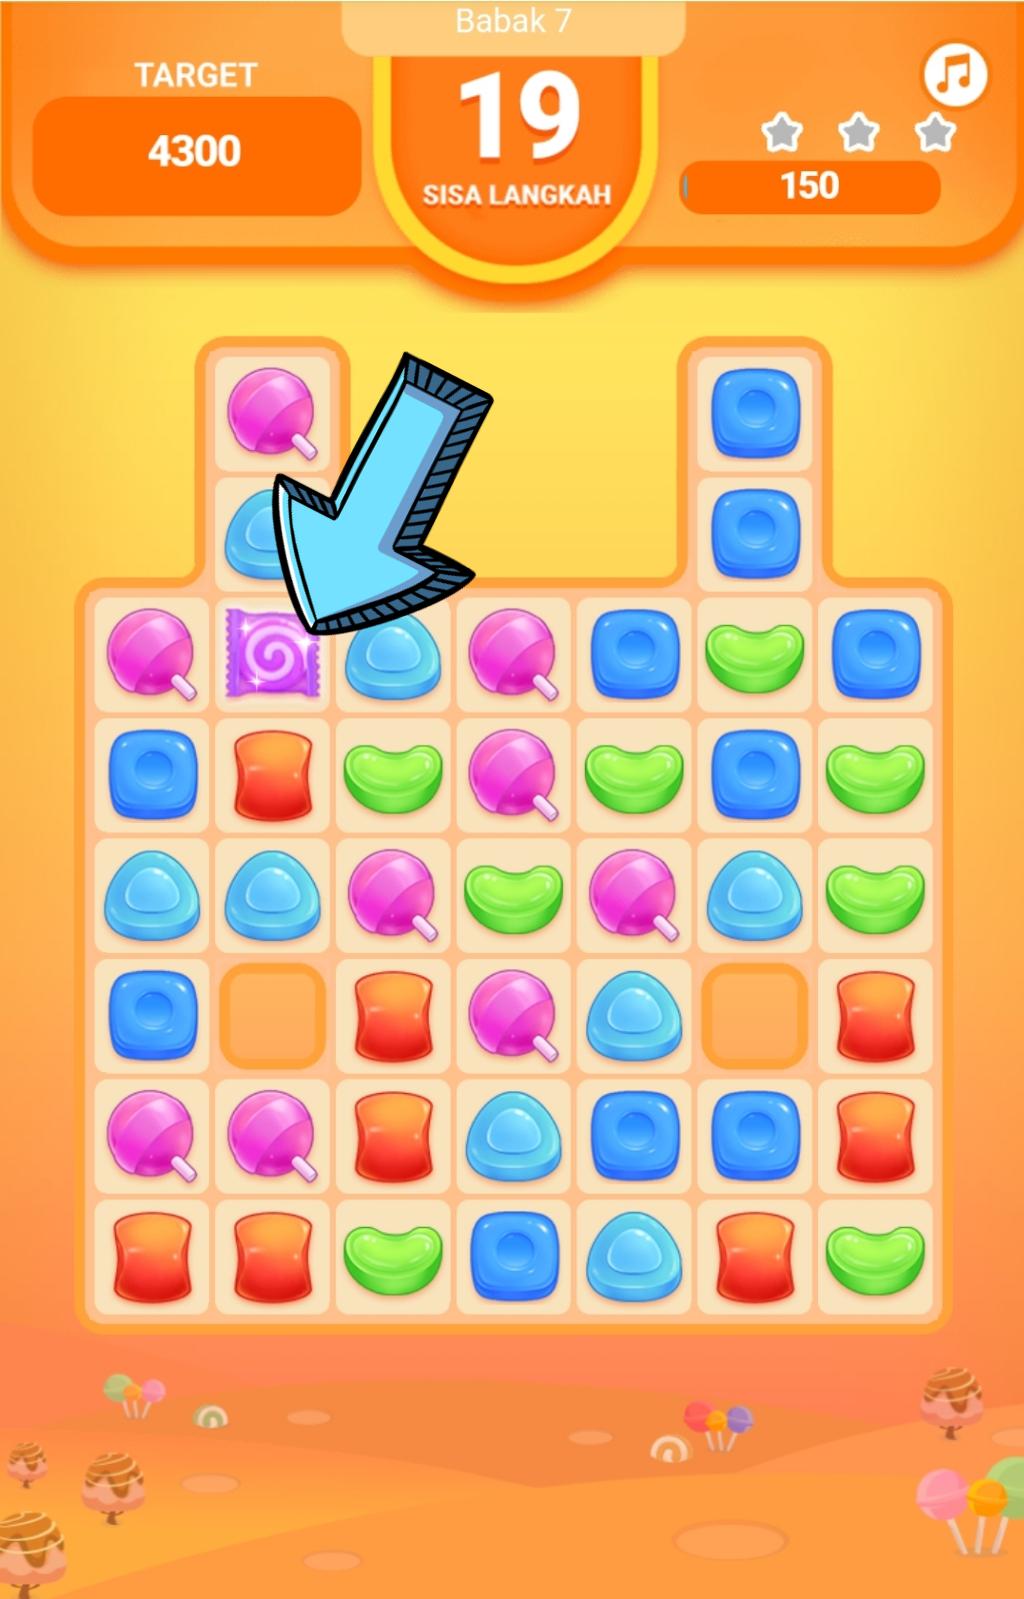 Shopee Games Terbaru, Fitur Shopee Games